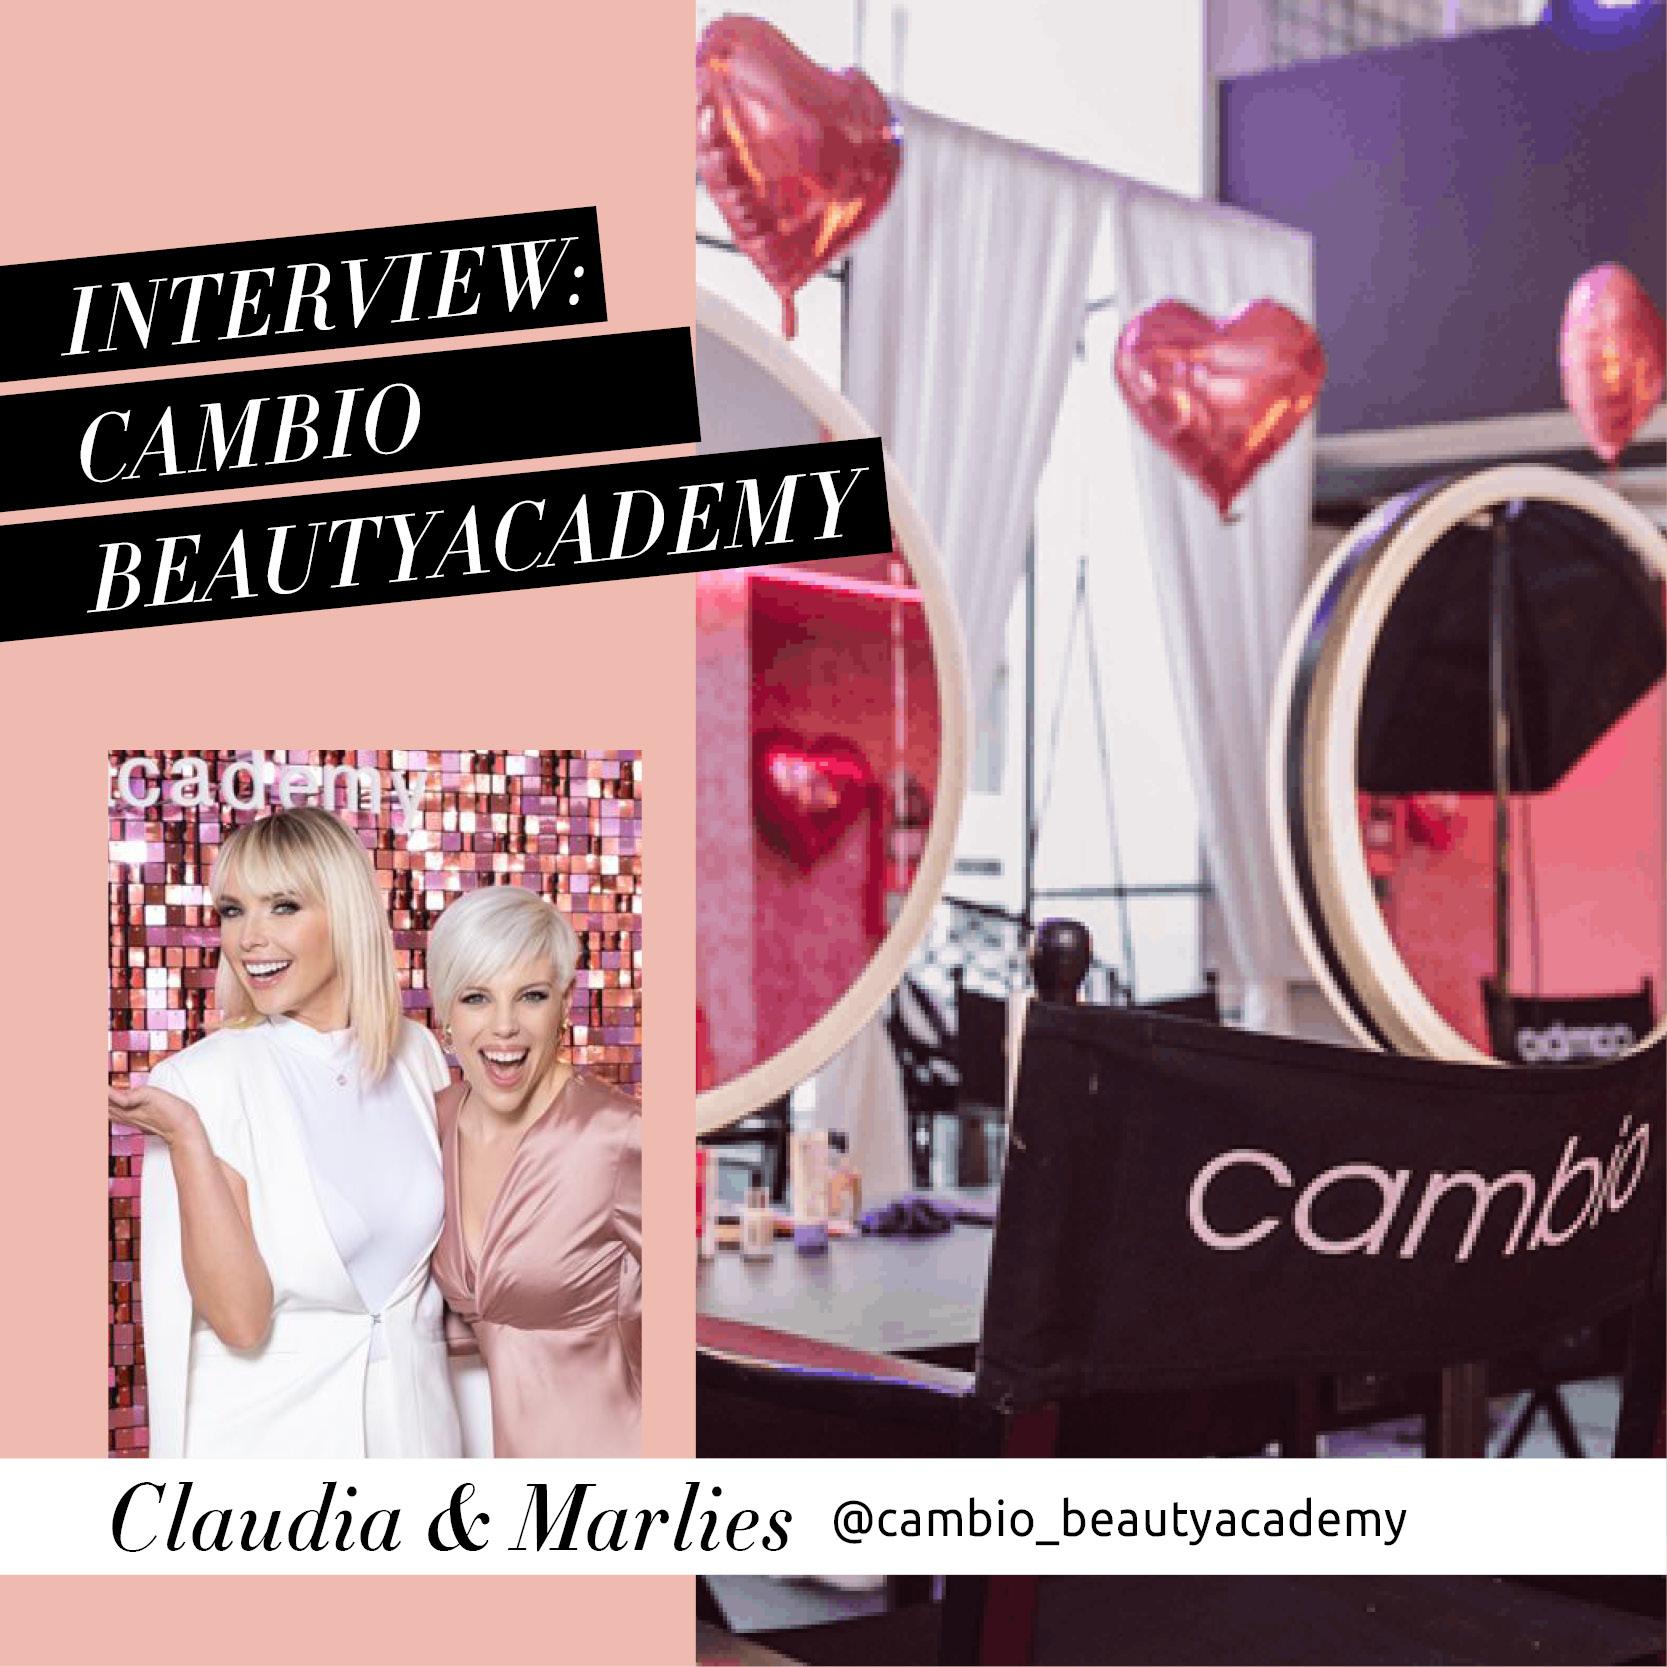 Interview: Cambio Beautyacademy